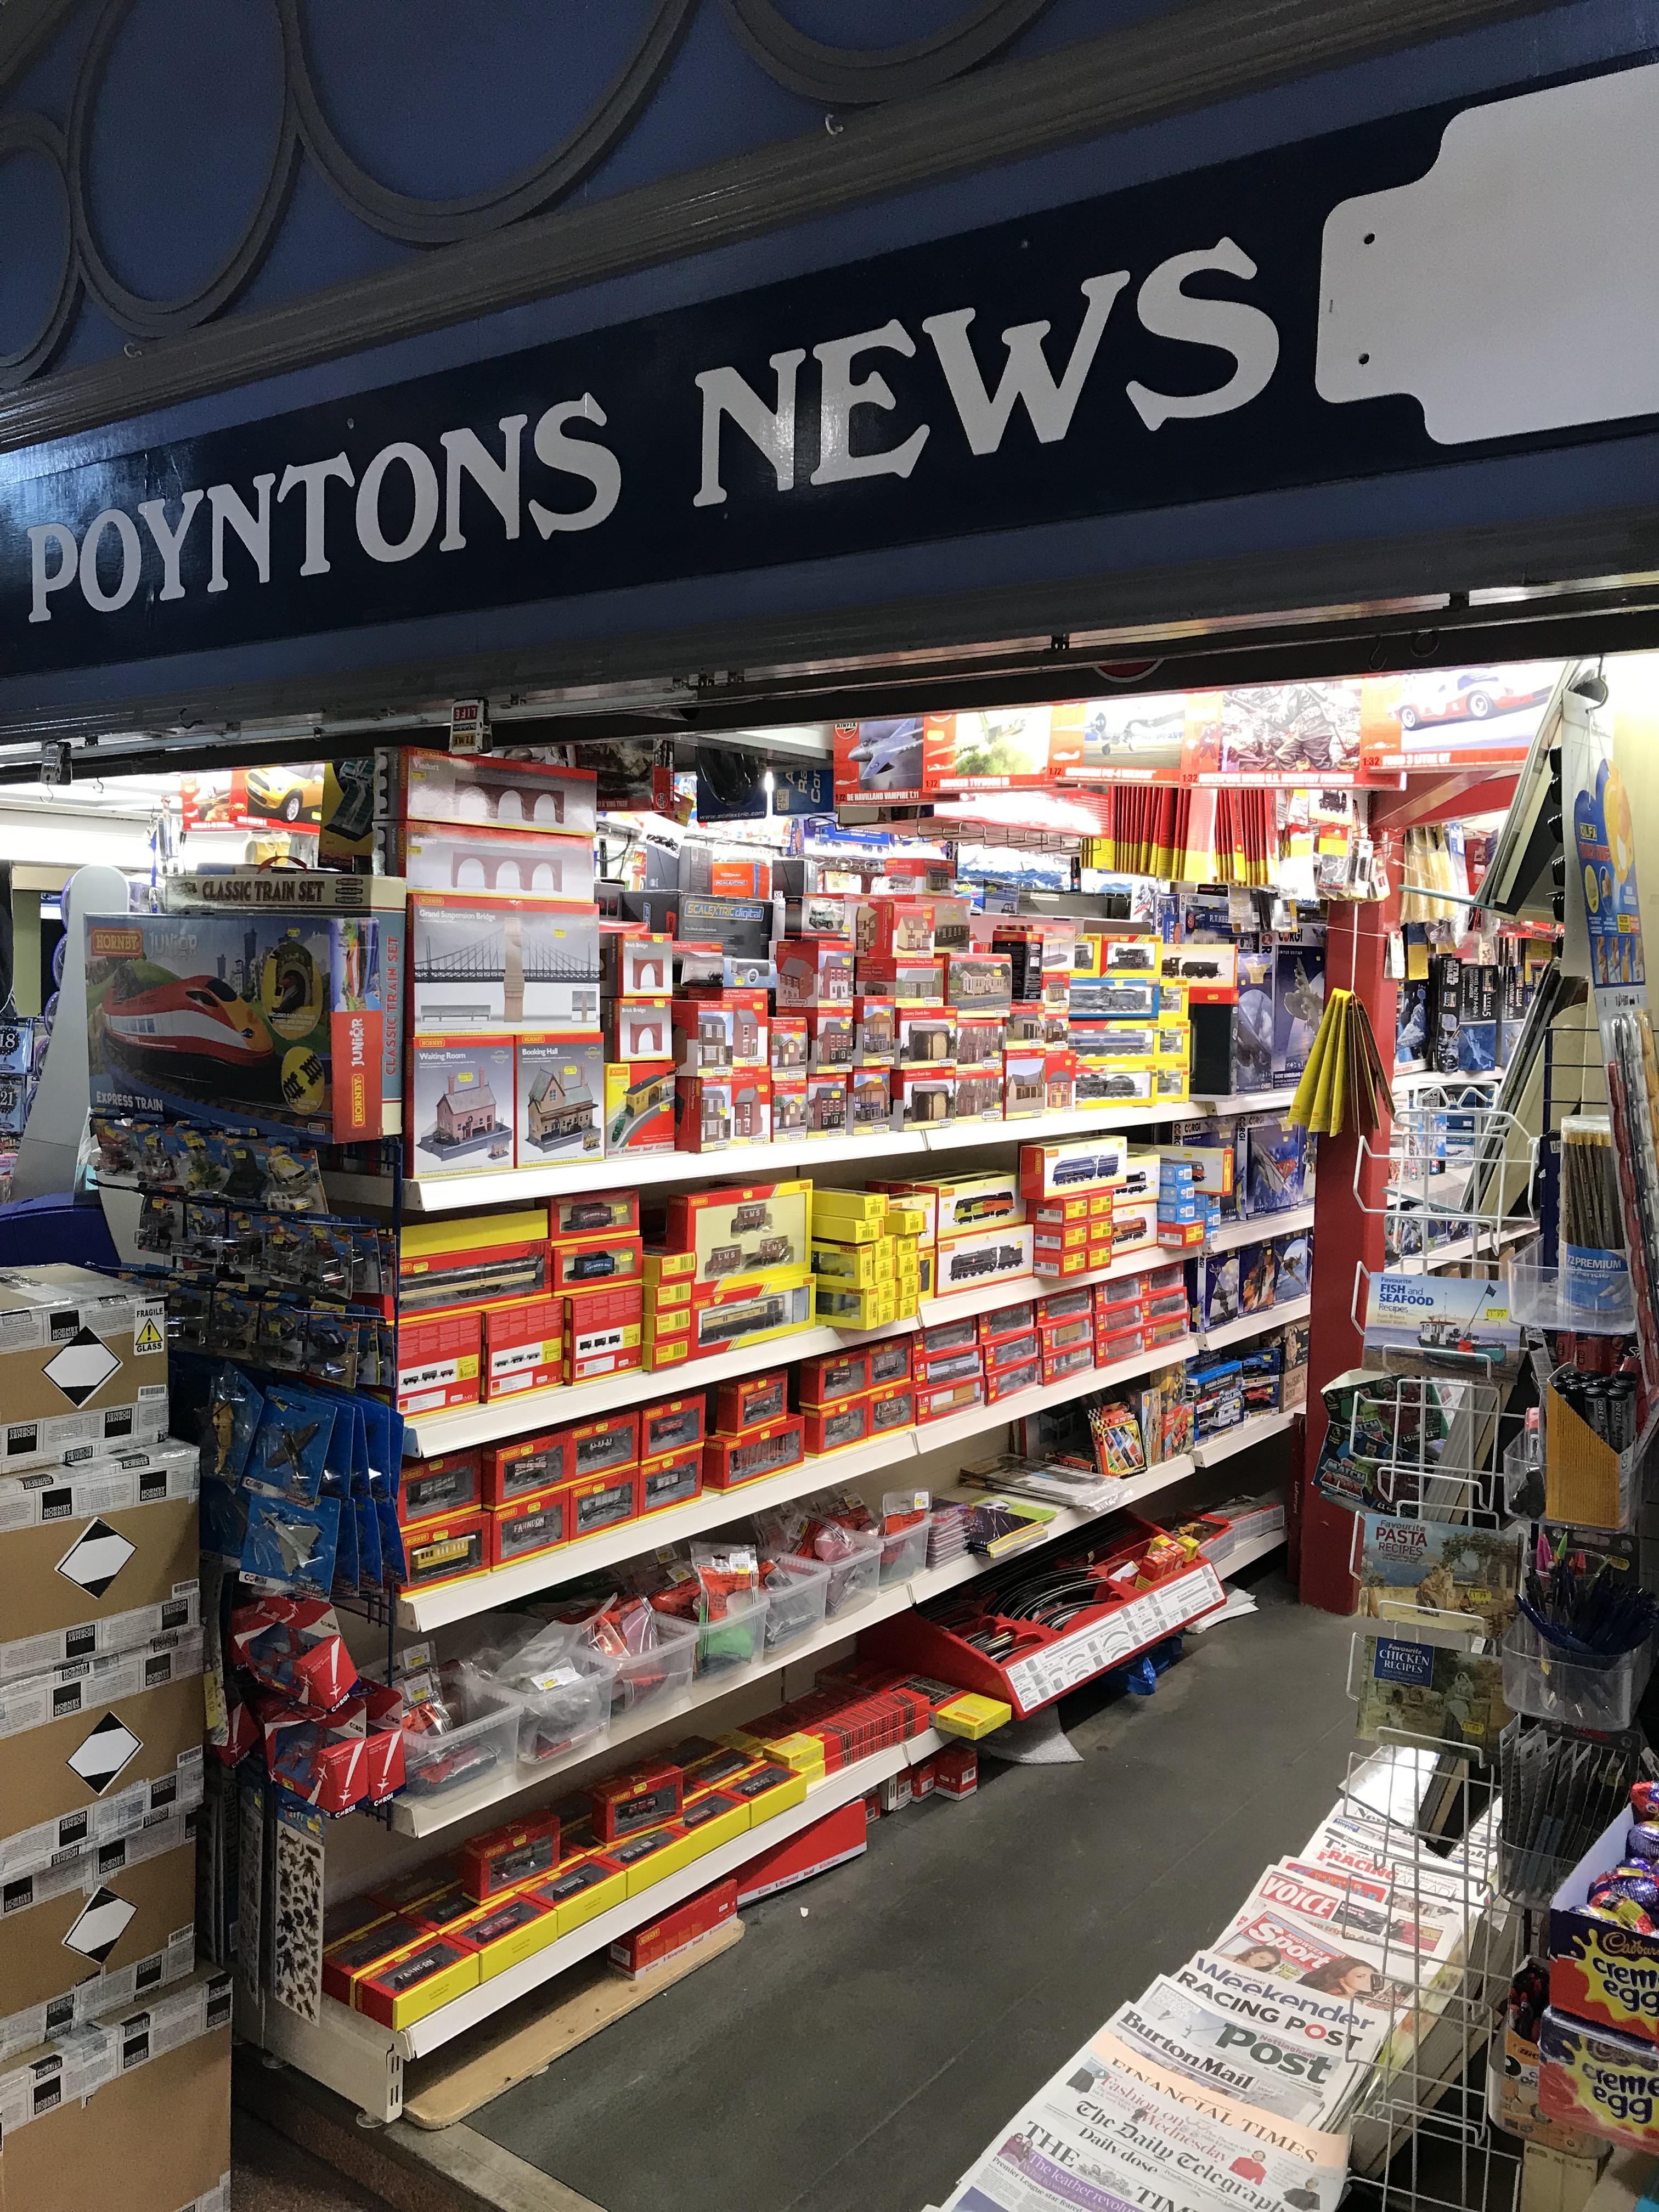 Poyntons